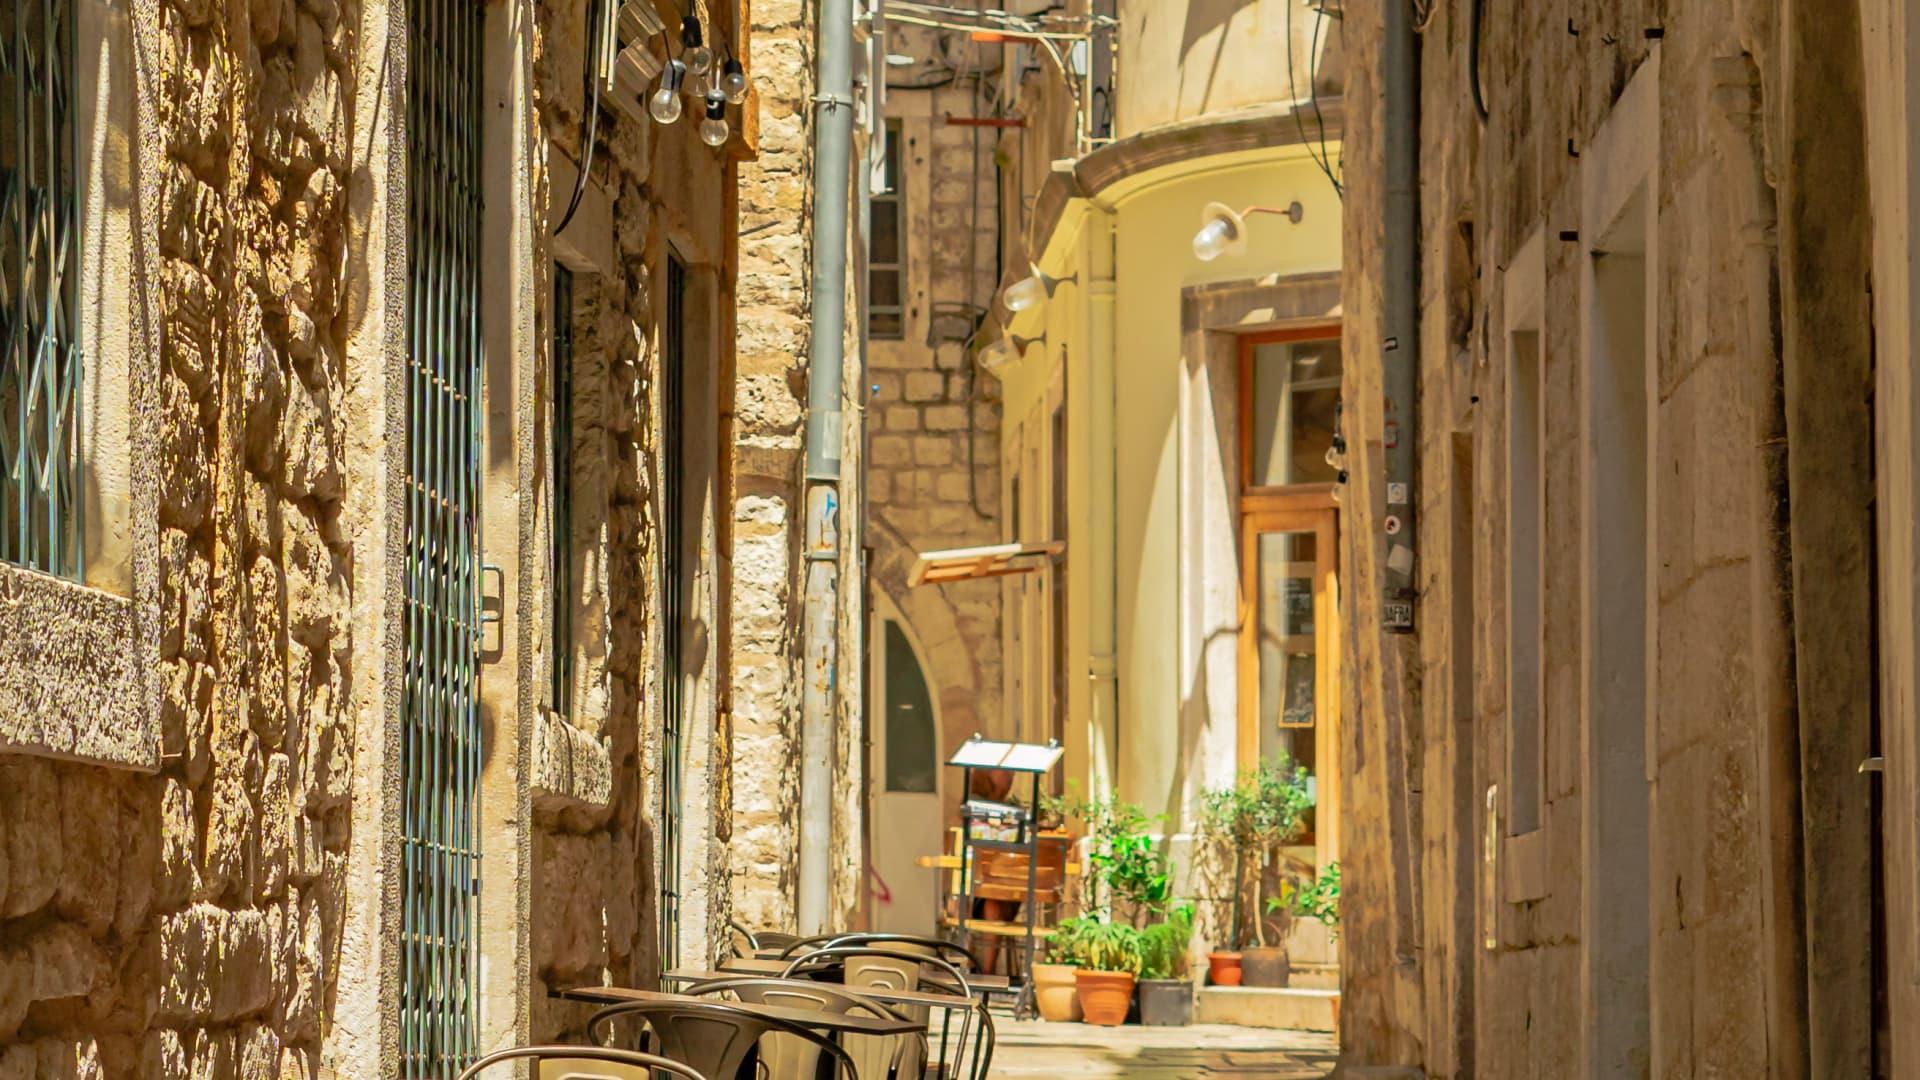 A beautiful street in the heart of downtown Split